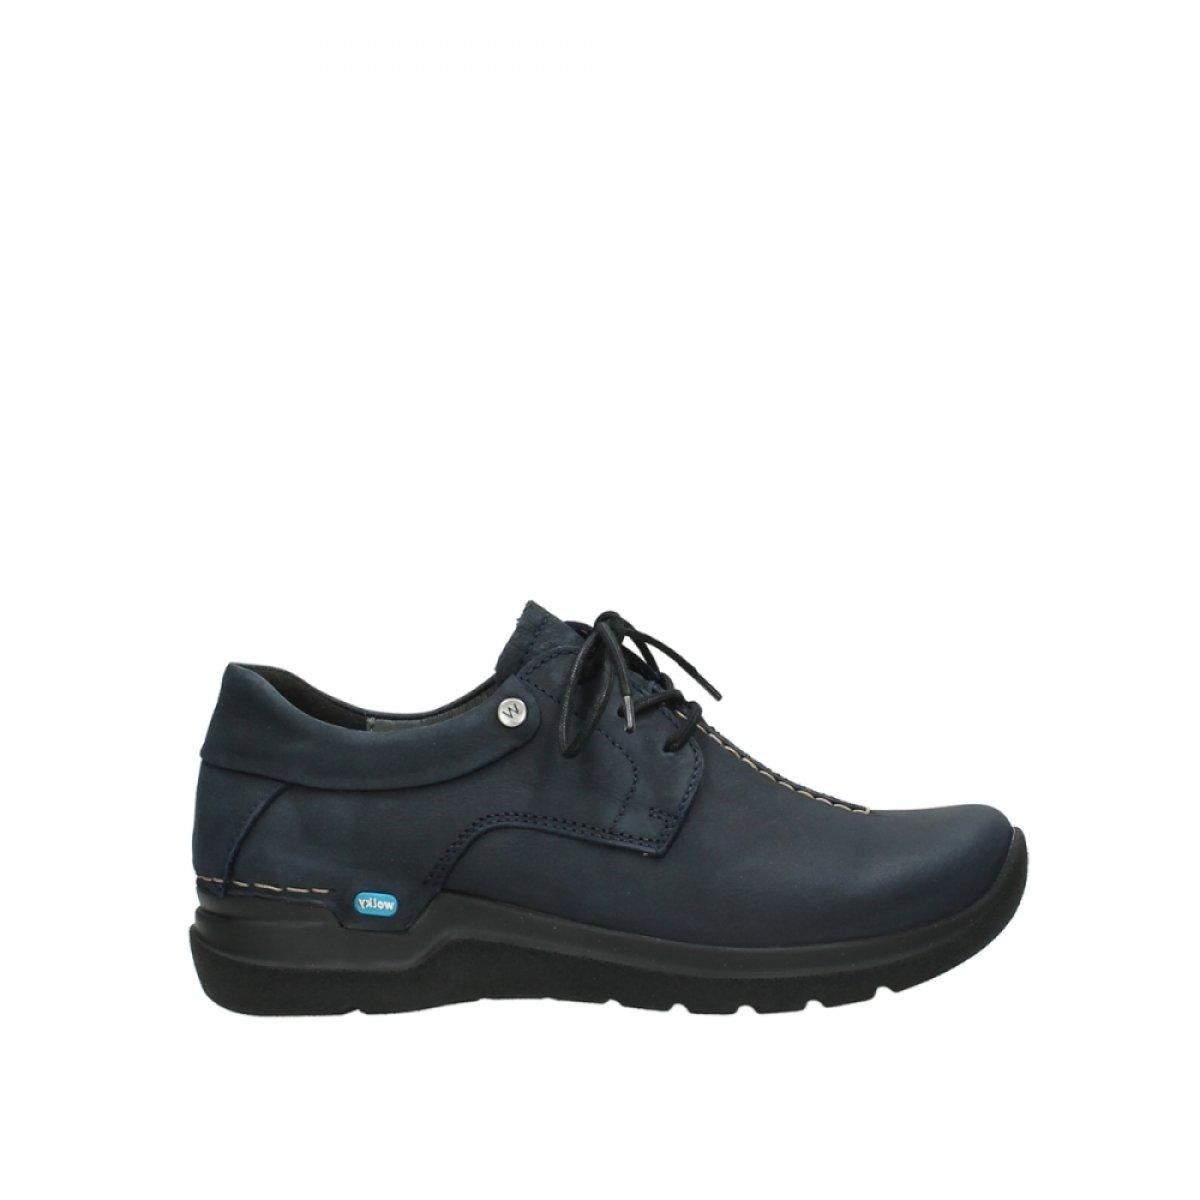 Wolky - Zapatos de Cordones para Mujer 38 EU|Azul